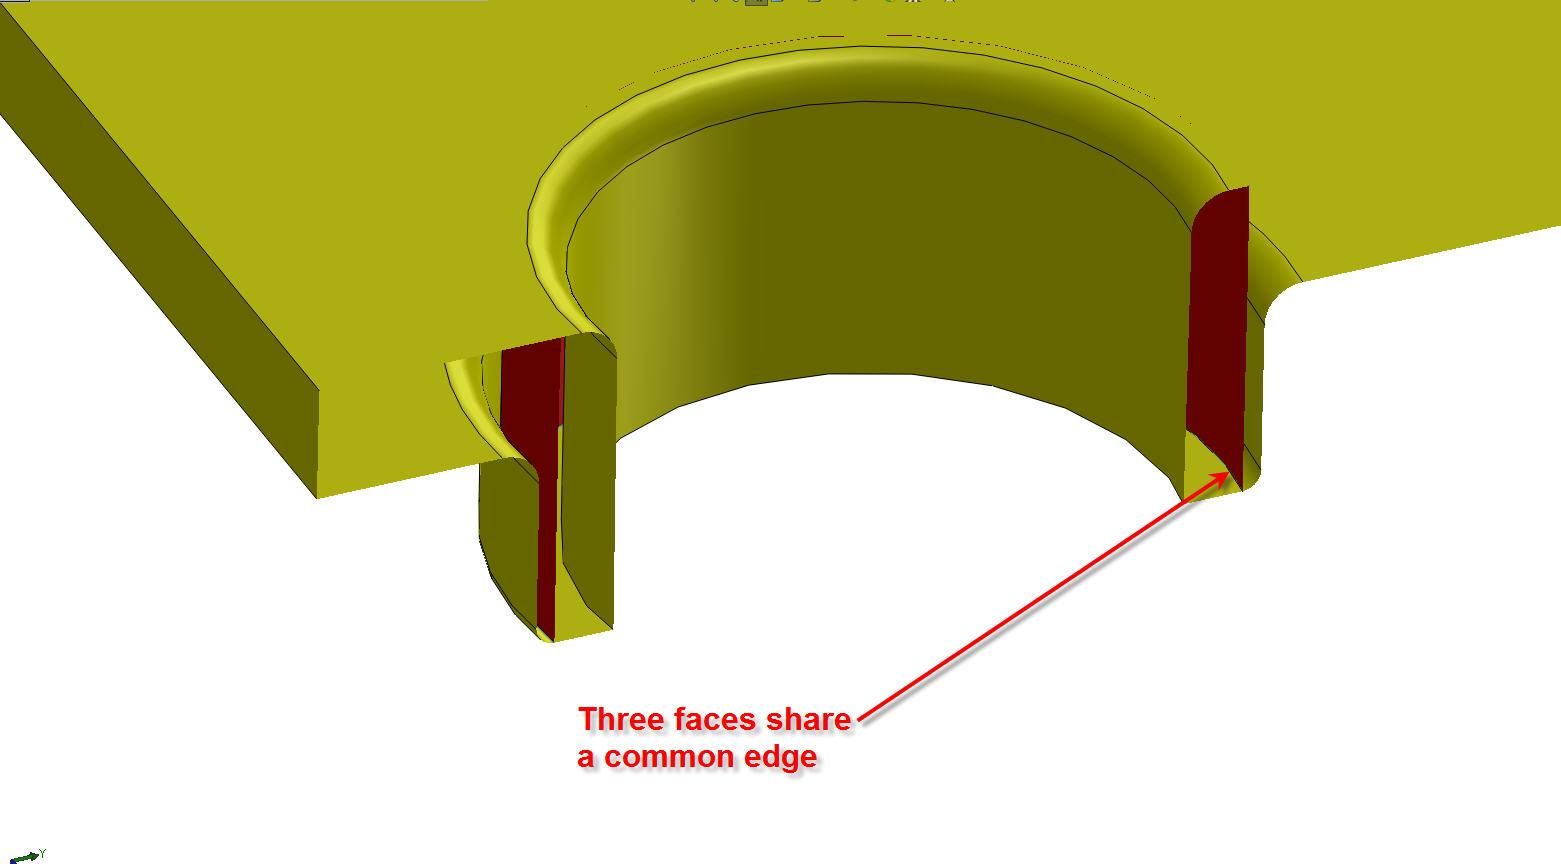 Topological Error - Three Faces Share an Edge